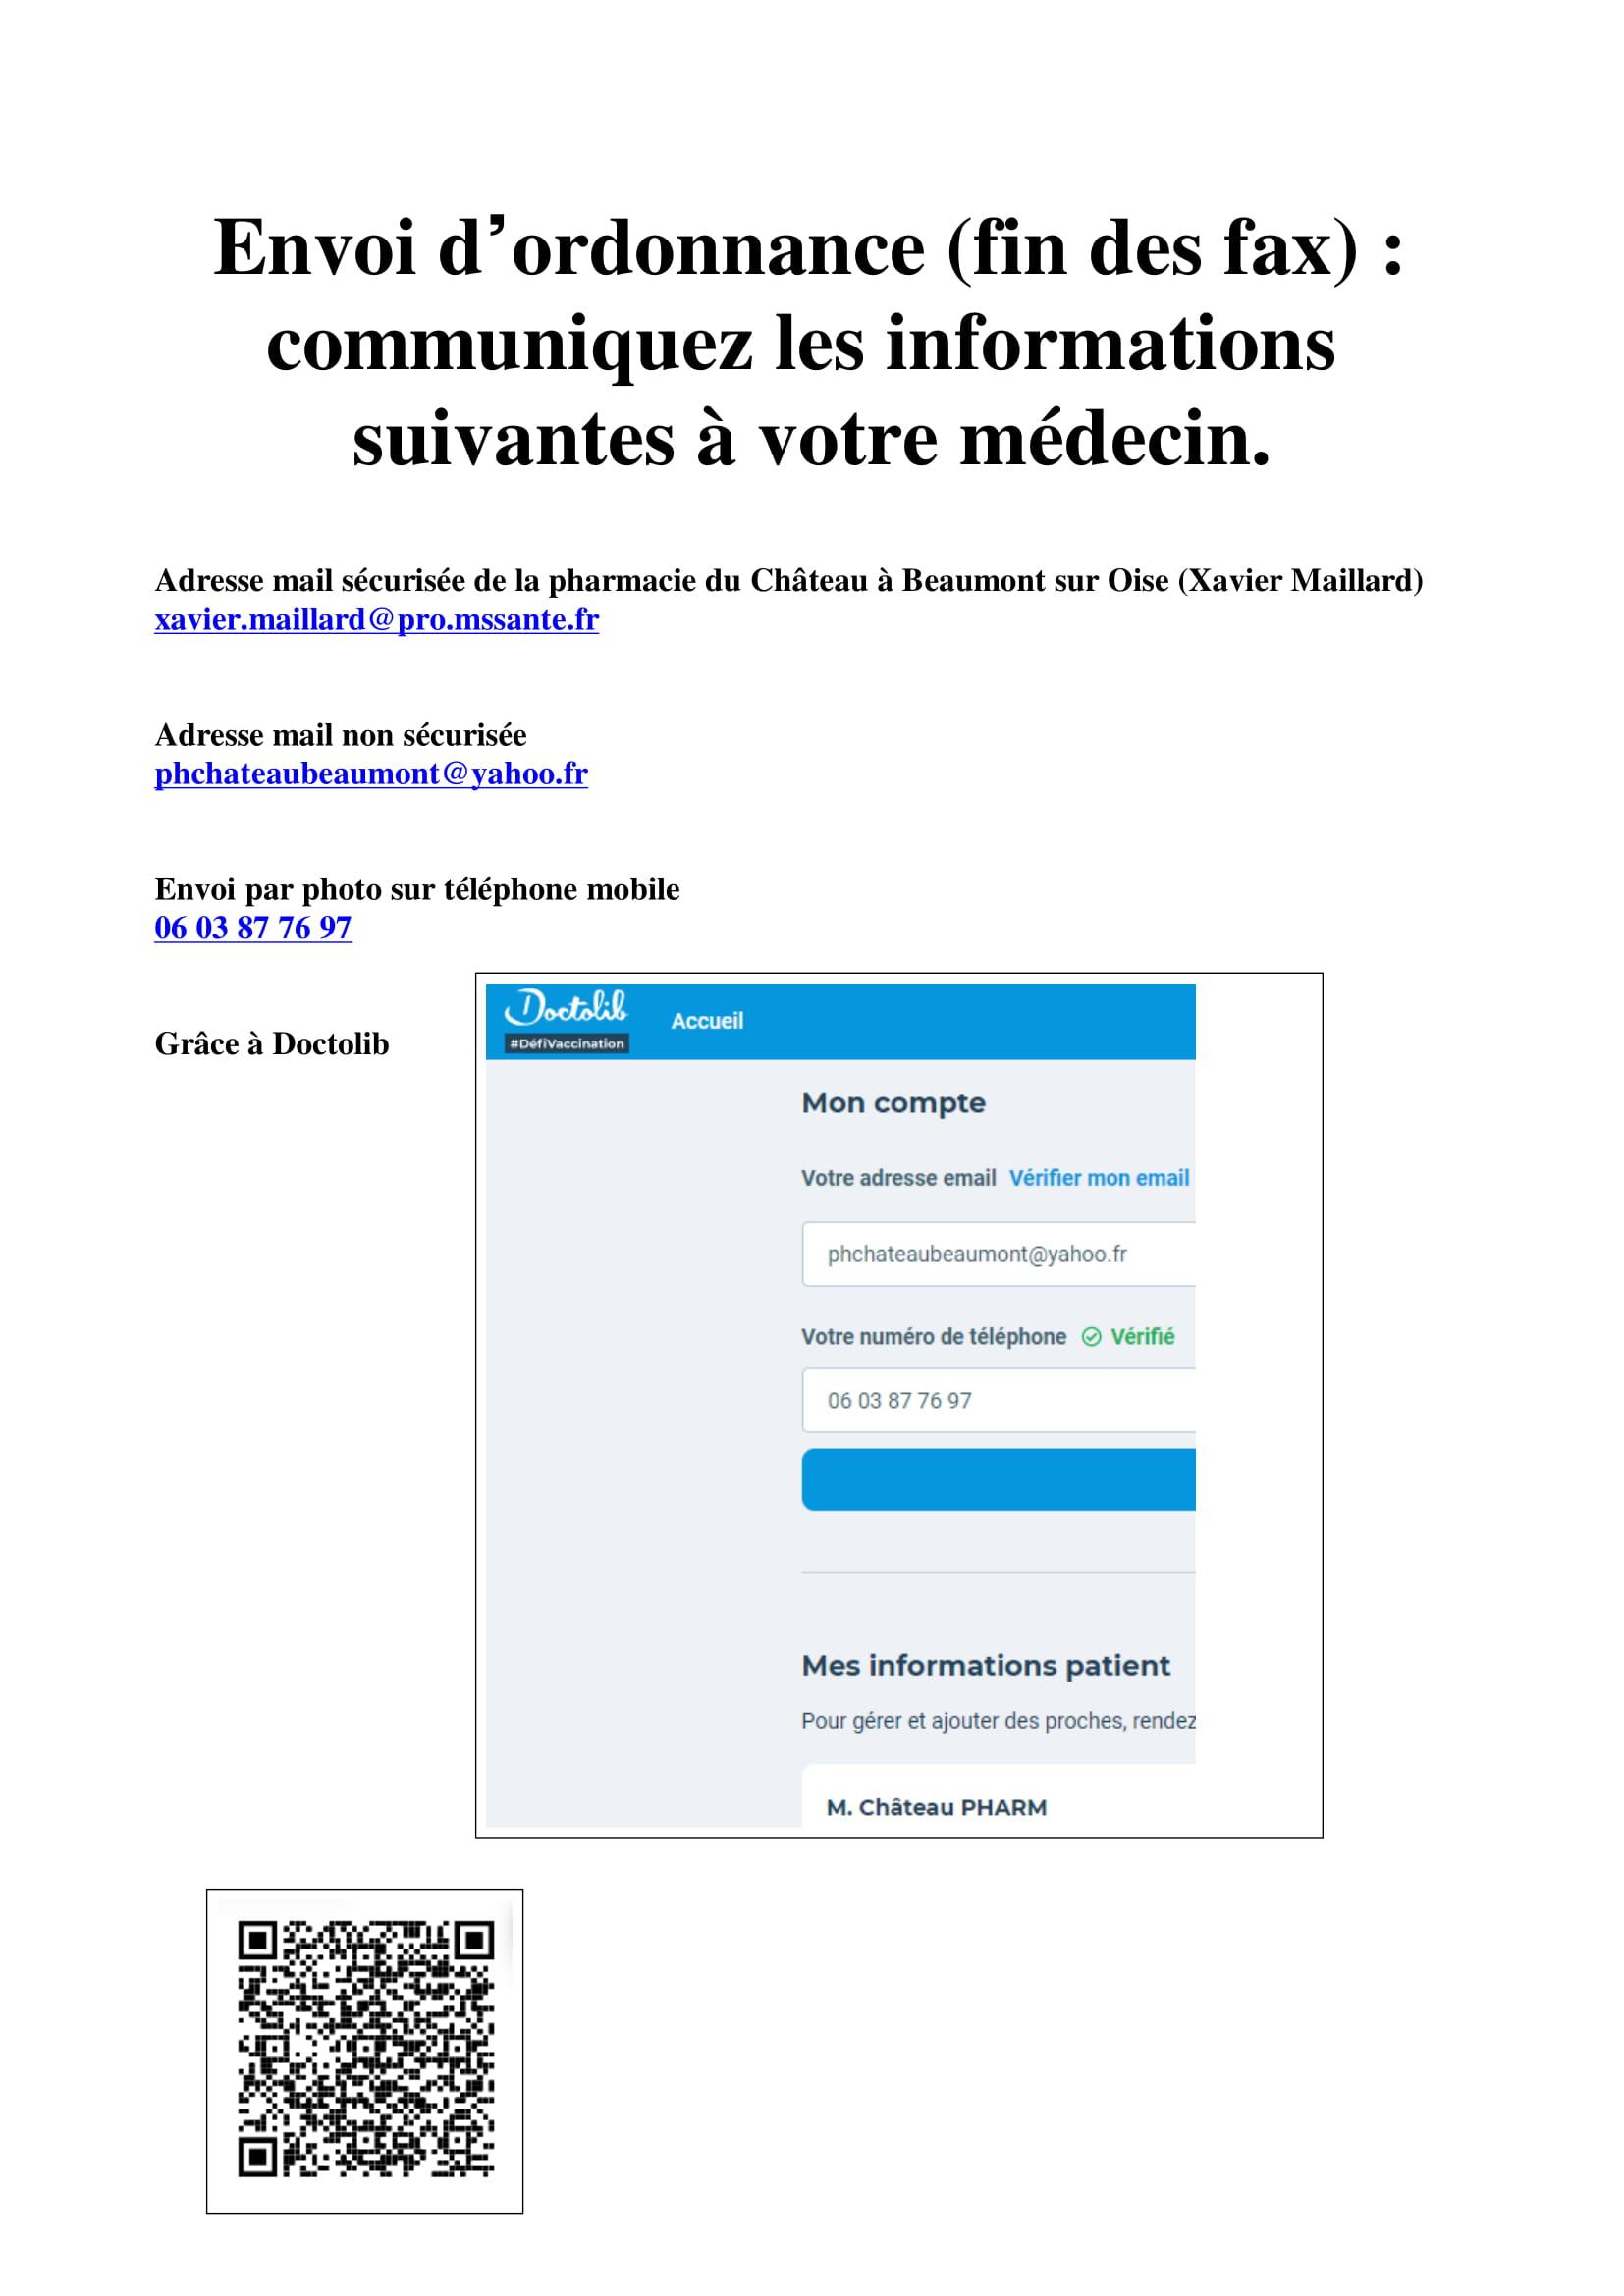 fin fax doctolib3-1.jpg